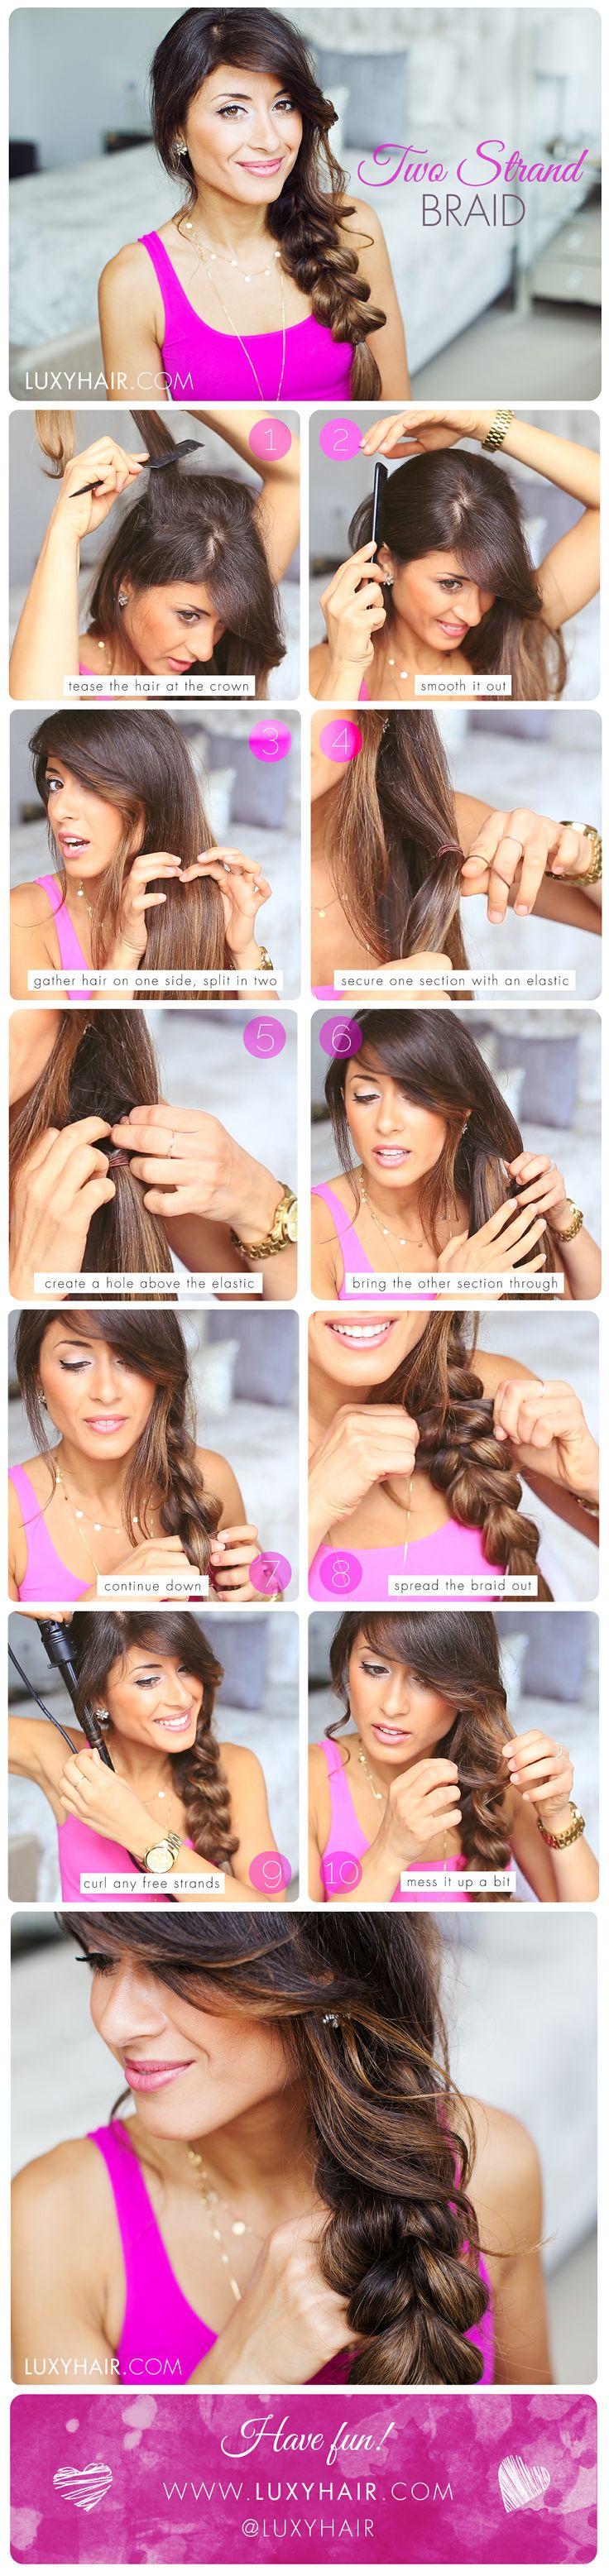 Pubic Hairstyles Unique Pinkayla Lenamond On Hair Styles  Pinterest  Hair Style